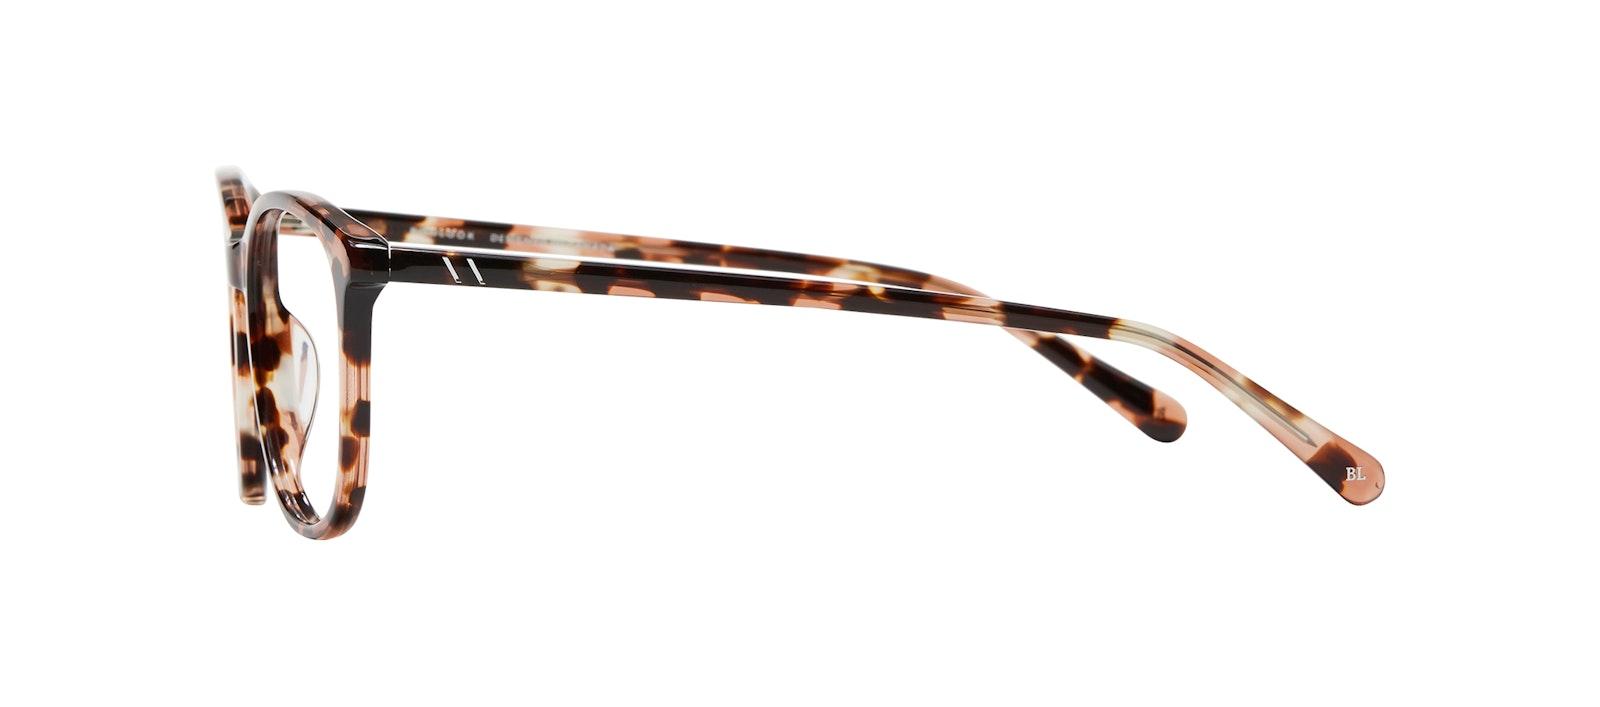 Affordable Fashion Glasses Rectangle Square Round Eyeglasses Women Nadine S Pink Tortoise Side